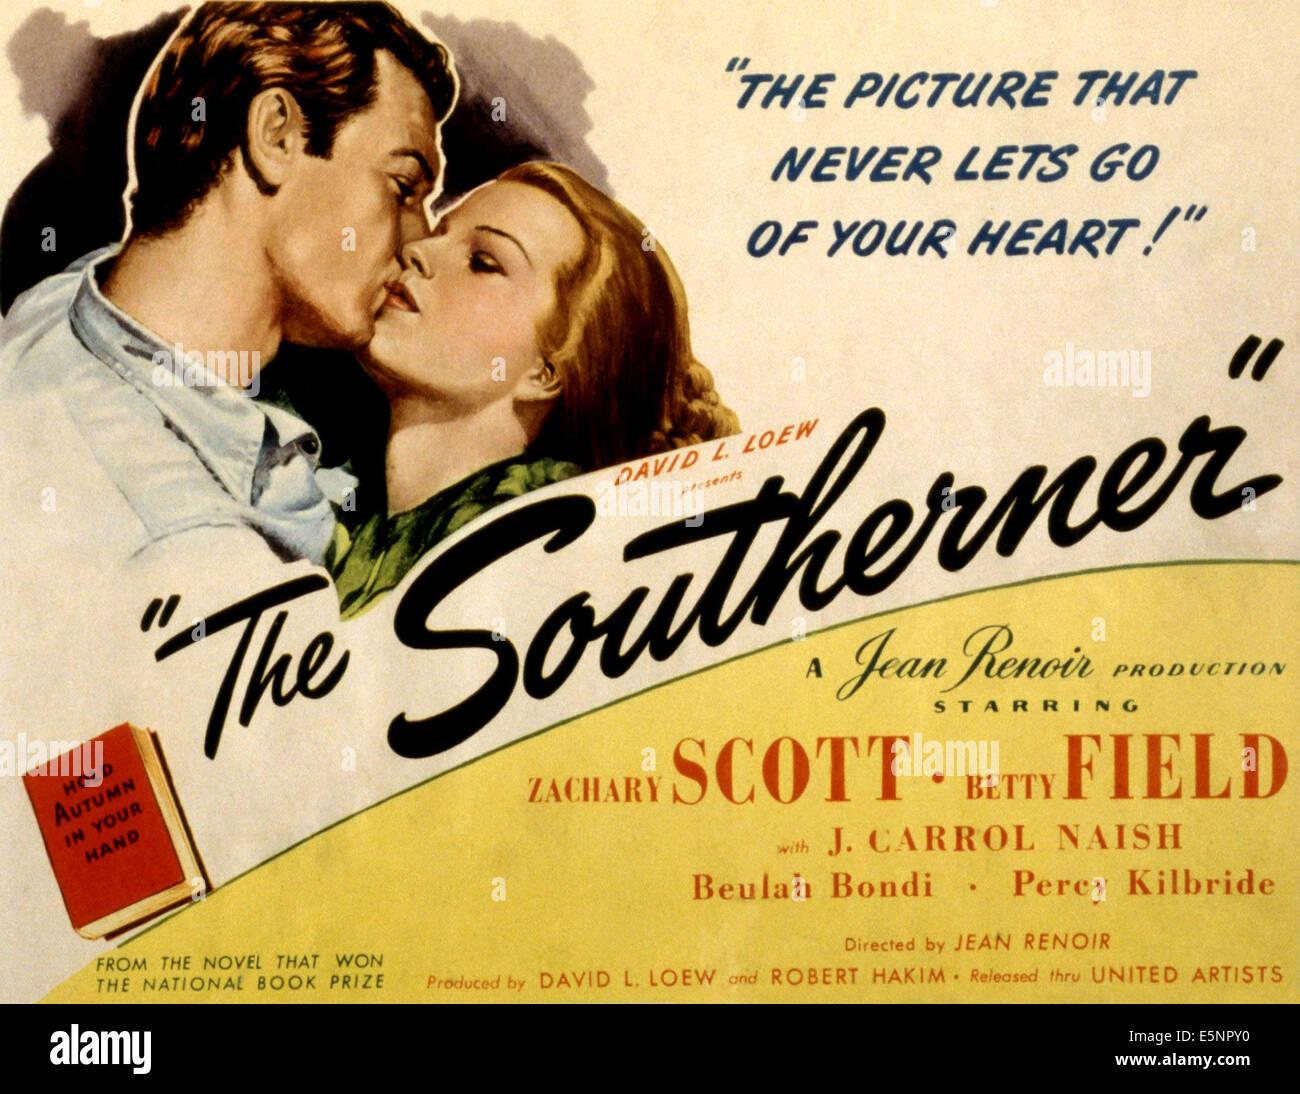 THE SOUTHERNER, Zachary Scott, Betty Field, 1945 - Stock Image